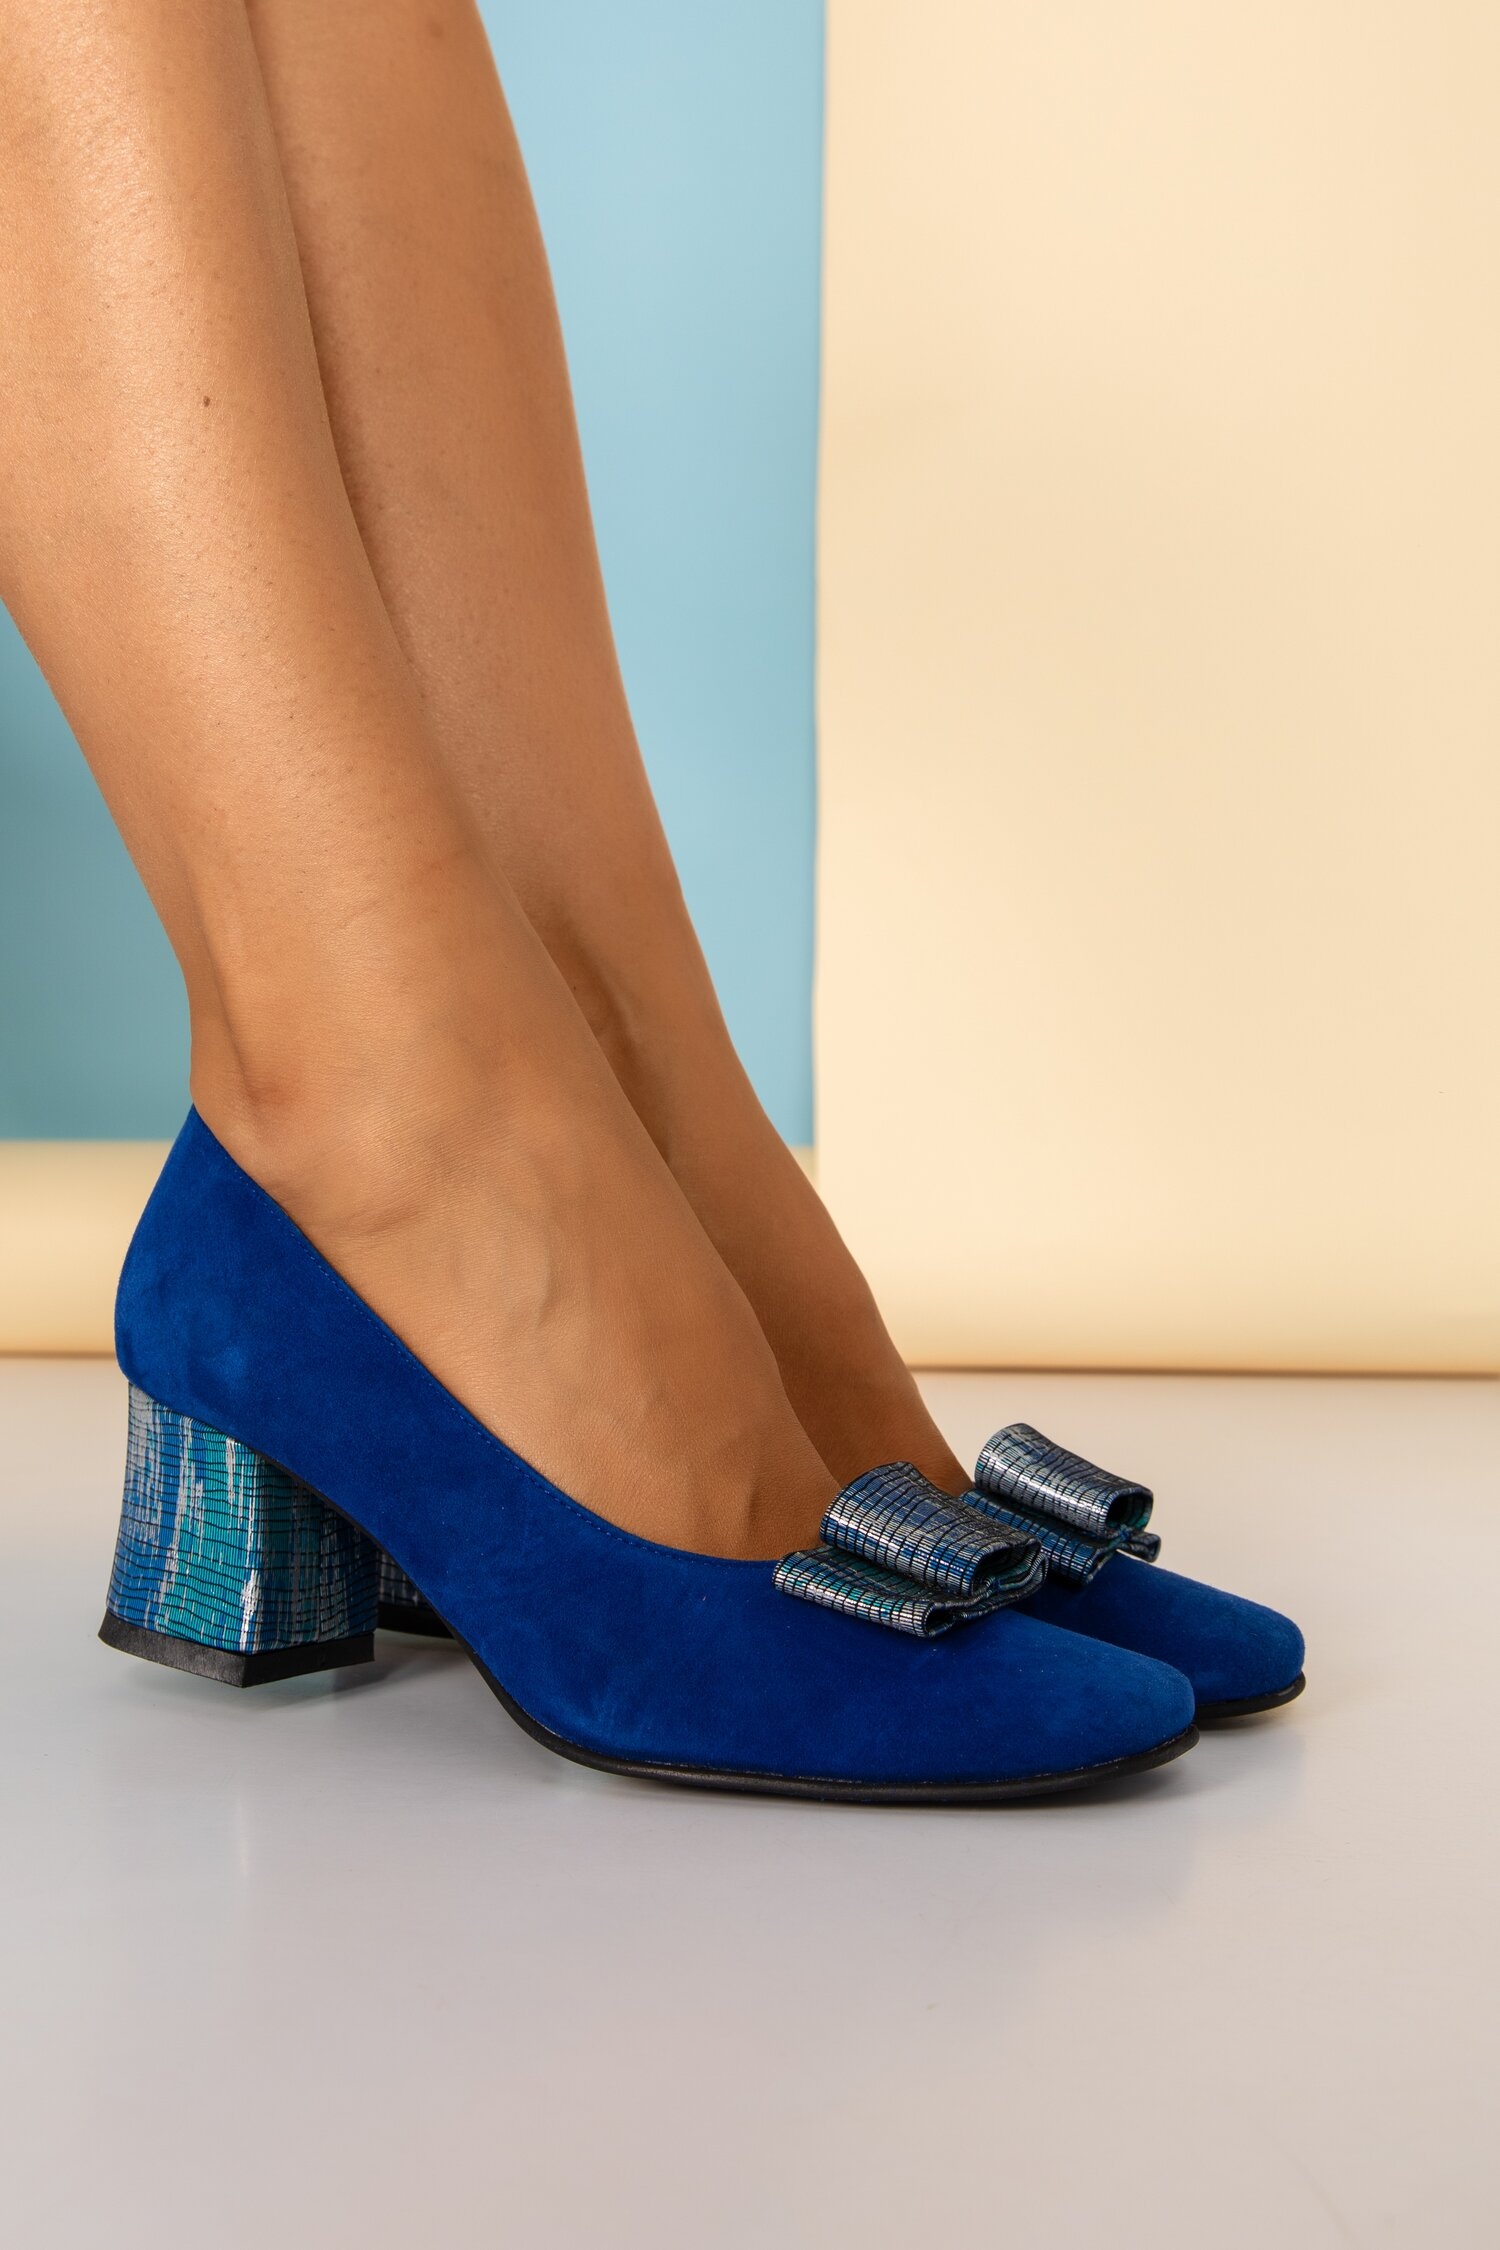 Pantofi albastri din piele naturala office cu imprimeu pe funda si toc